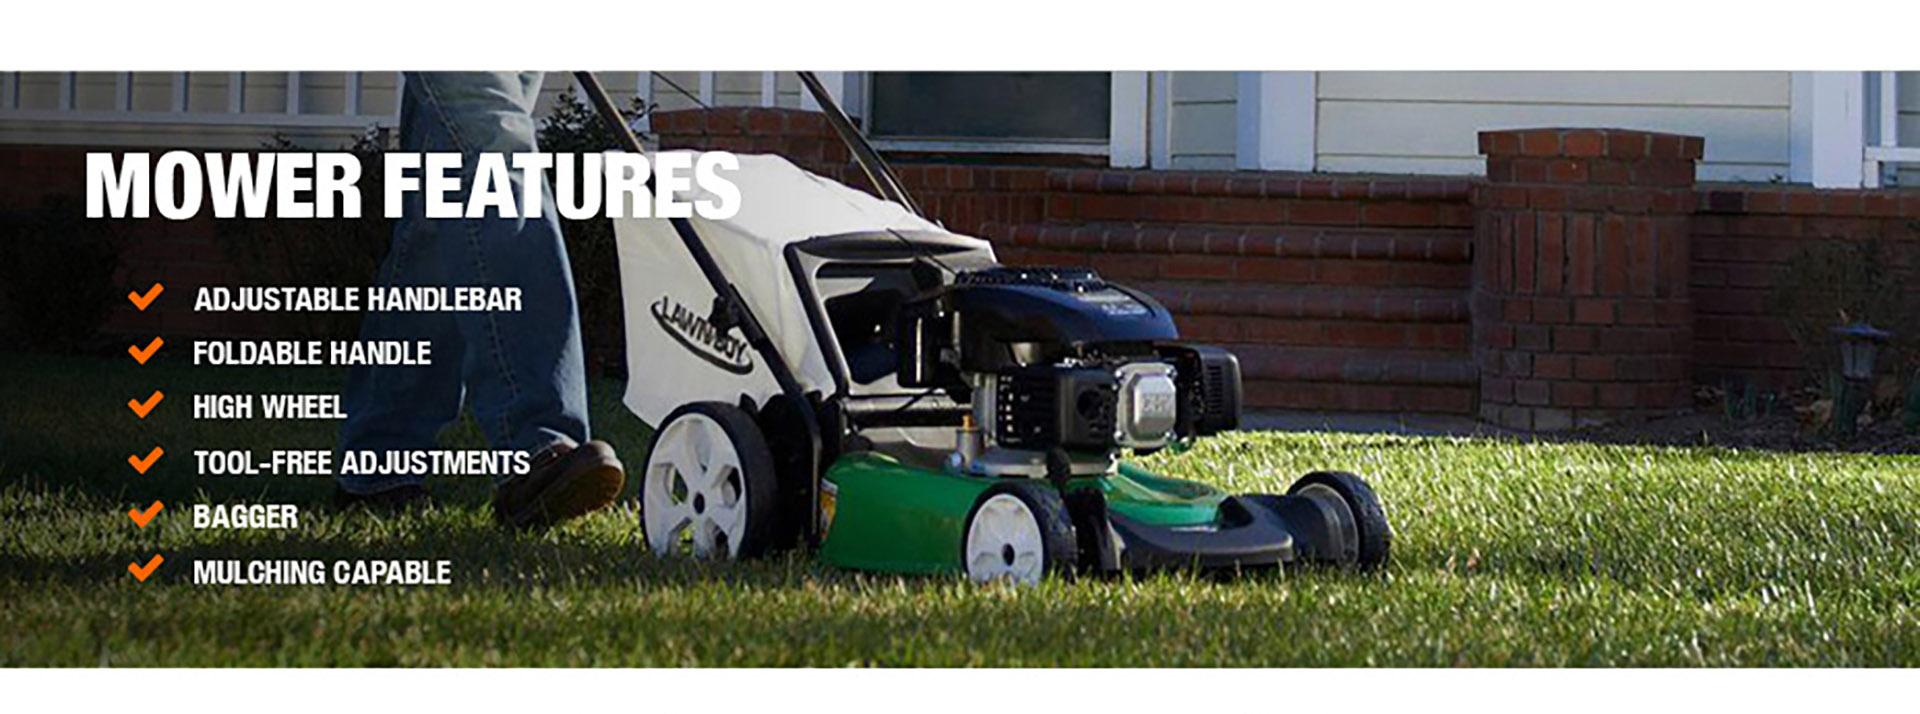 Lawn-Boy 21 in  High Wheel Gas Walk Behind Push Mower with Kohler Engine